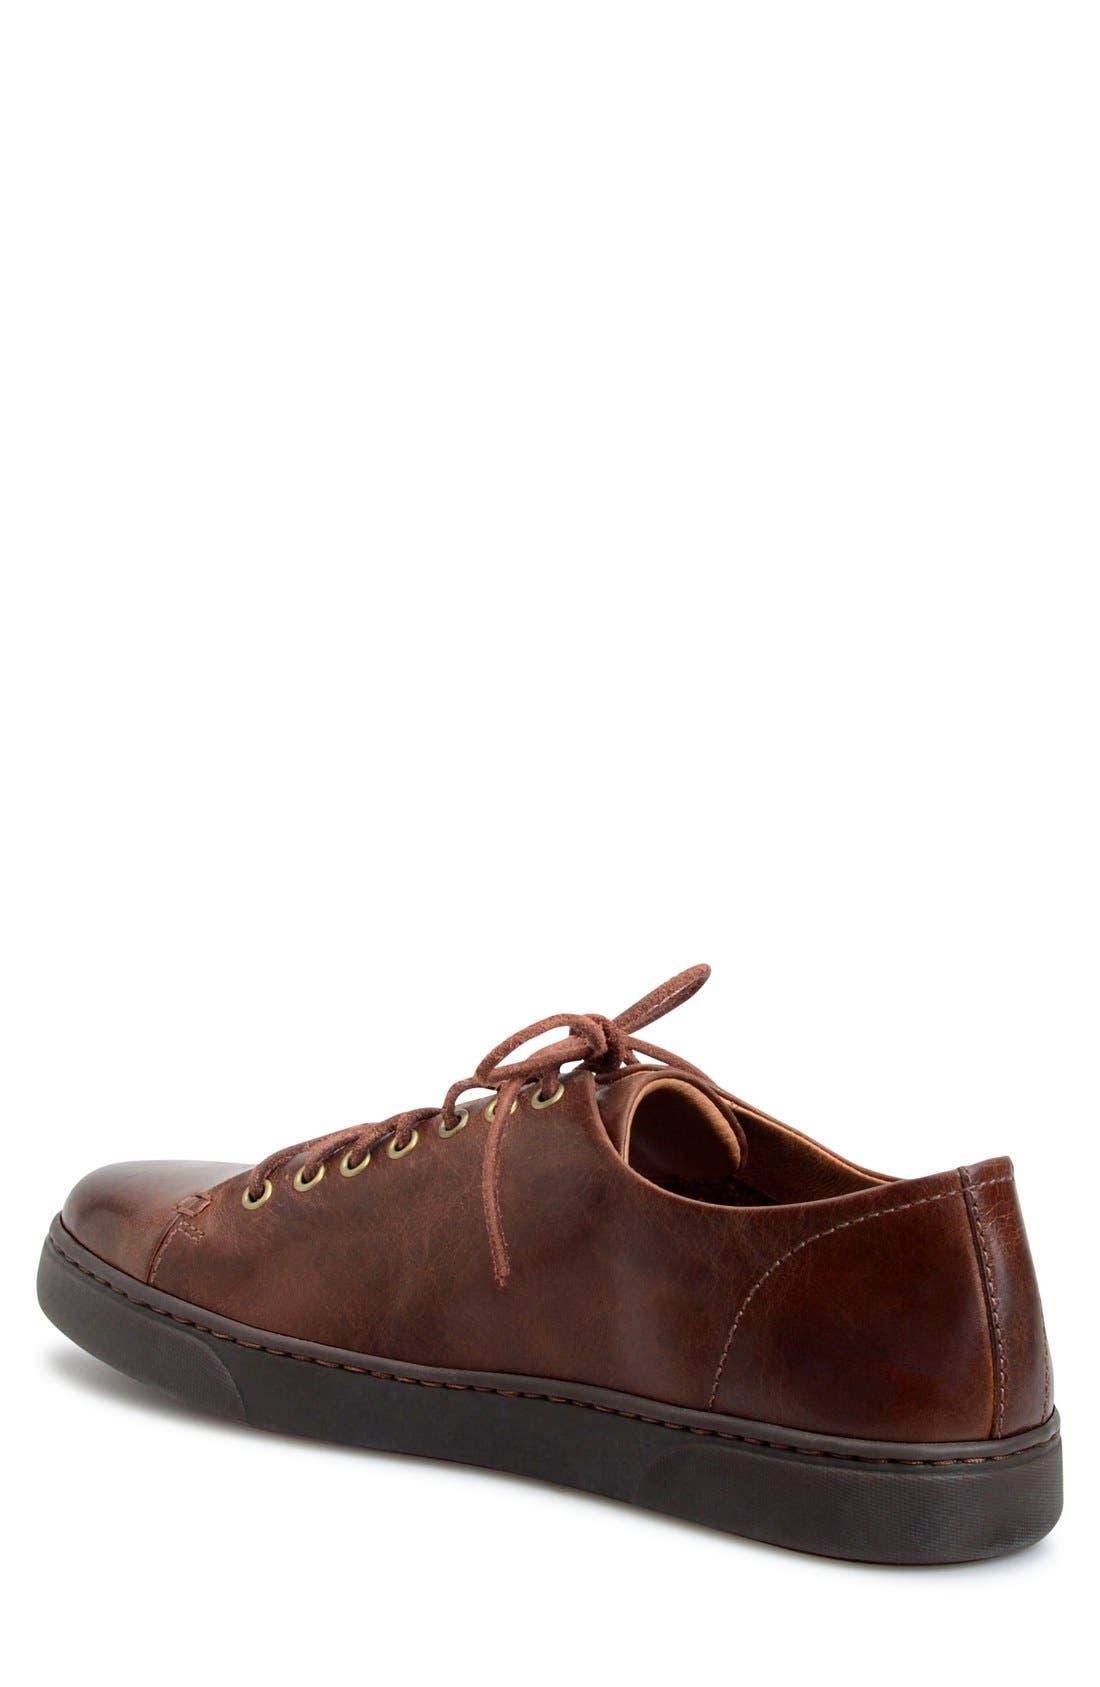 'Bayne' Cap Toe Sneaker,                             Alternate thumbnail 17, color,